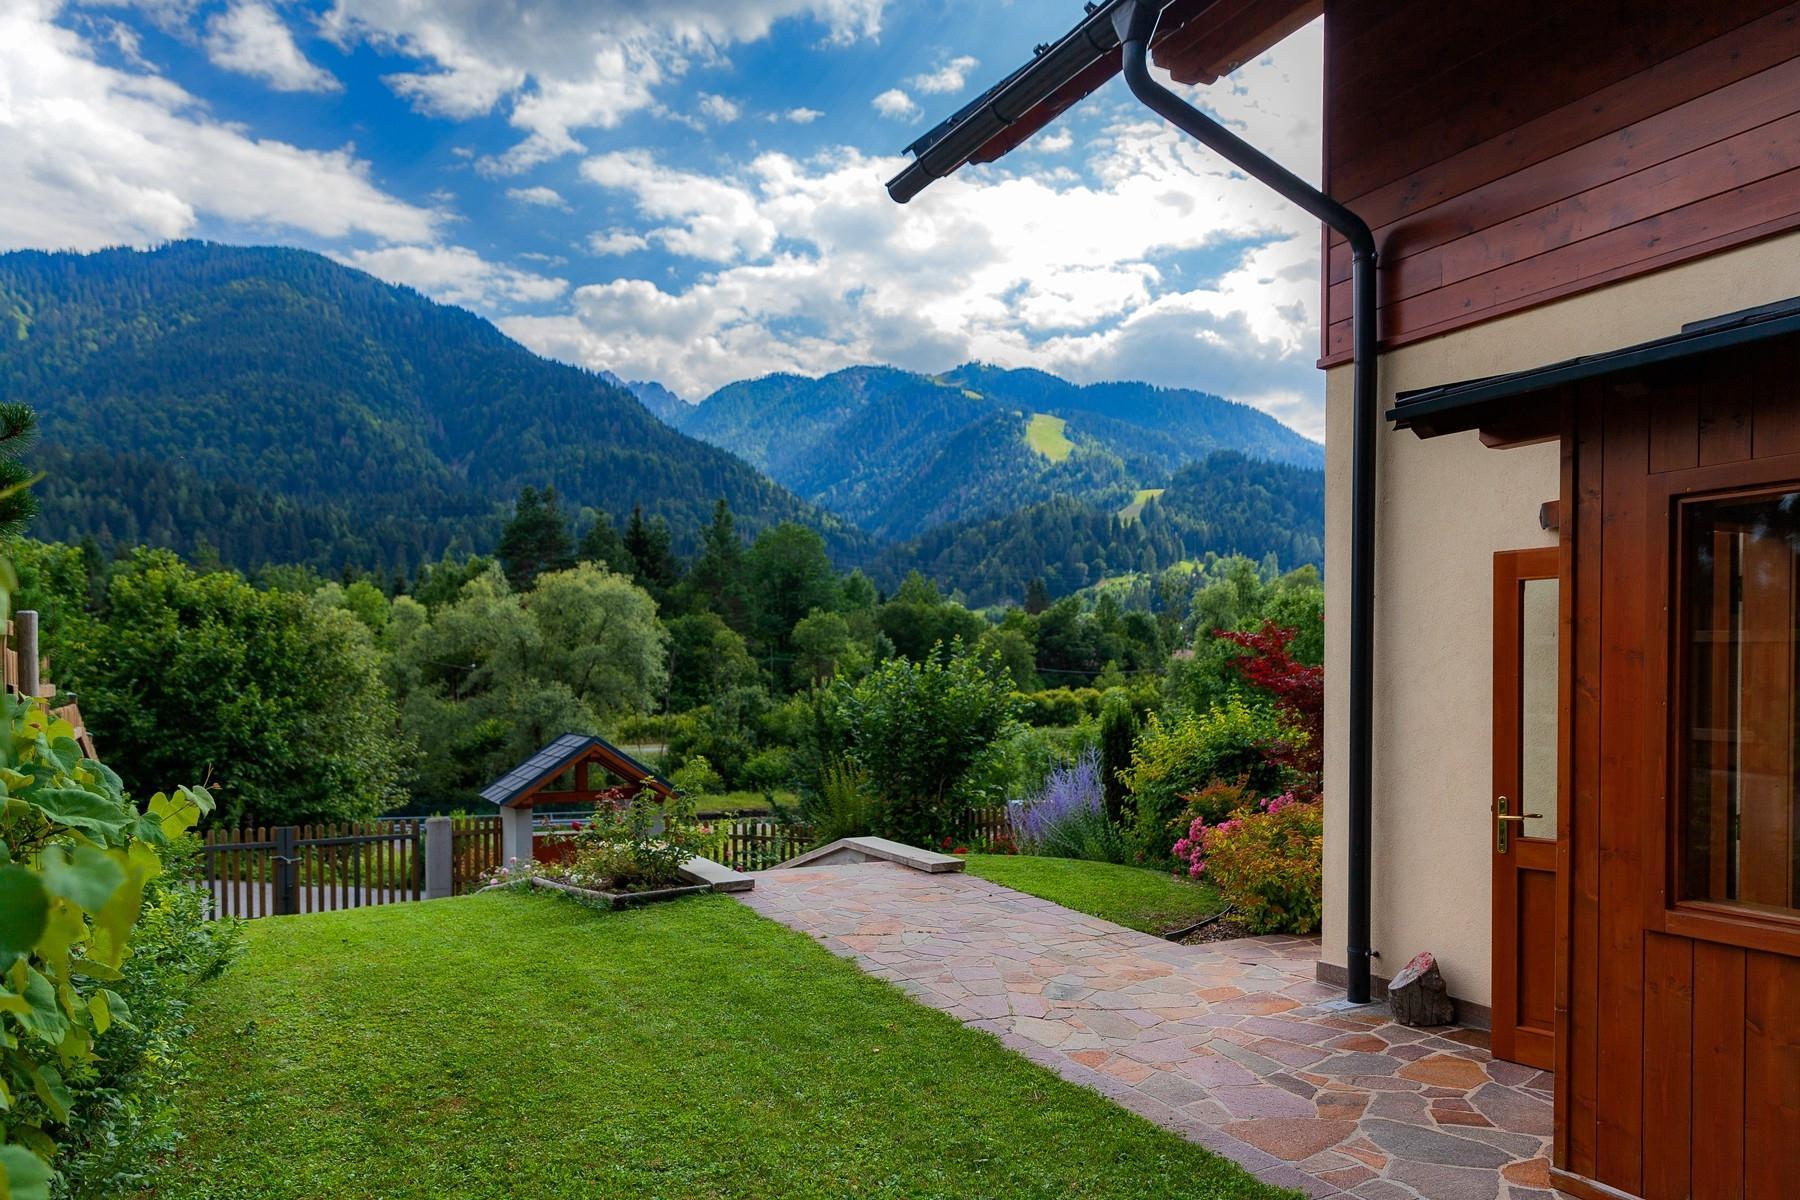 Bellissimo chalet con strepitosa vista sulle Alpi Giulie - 3